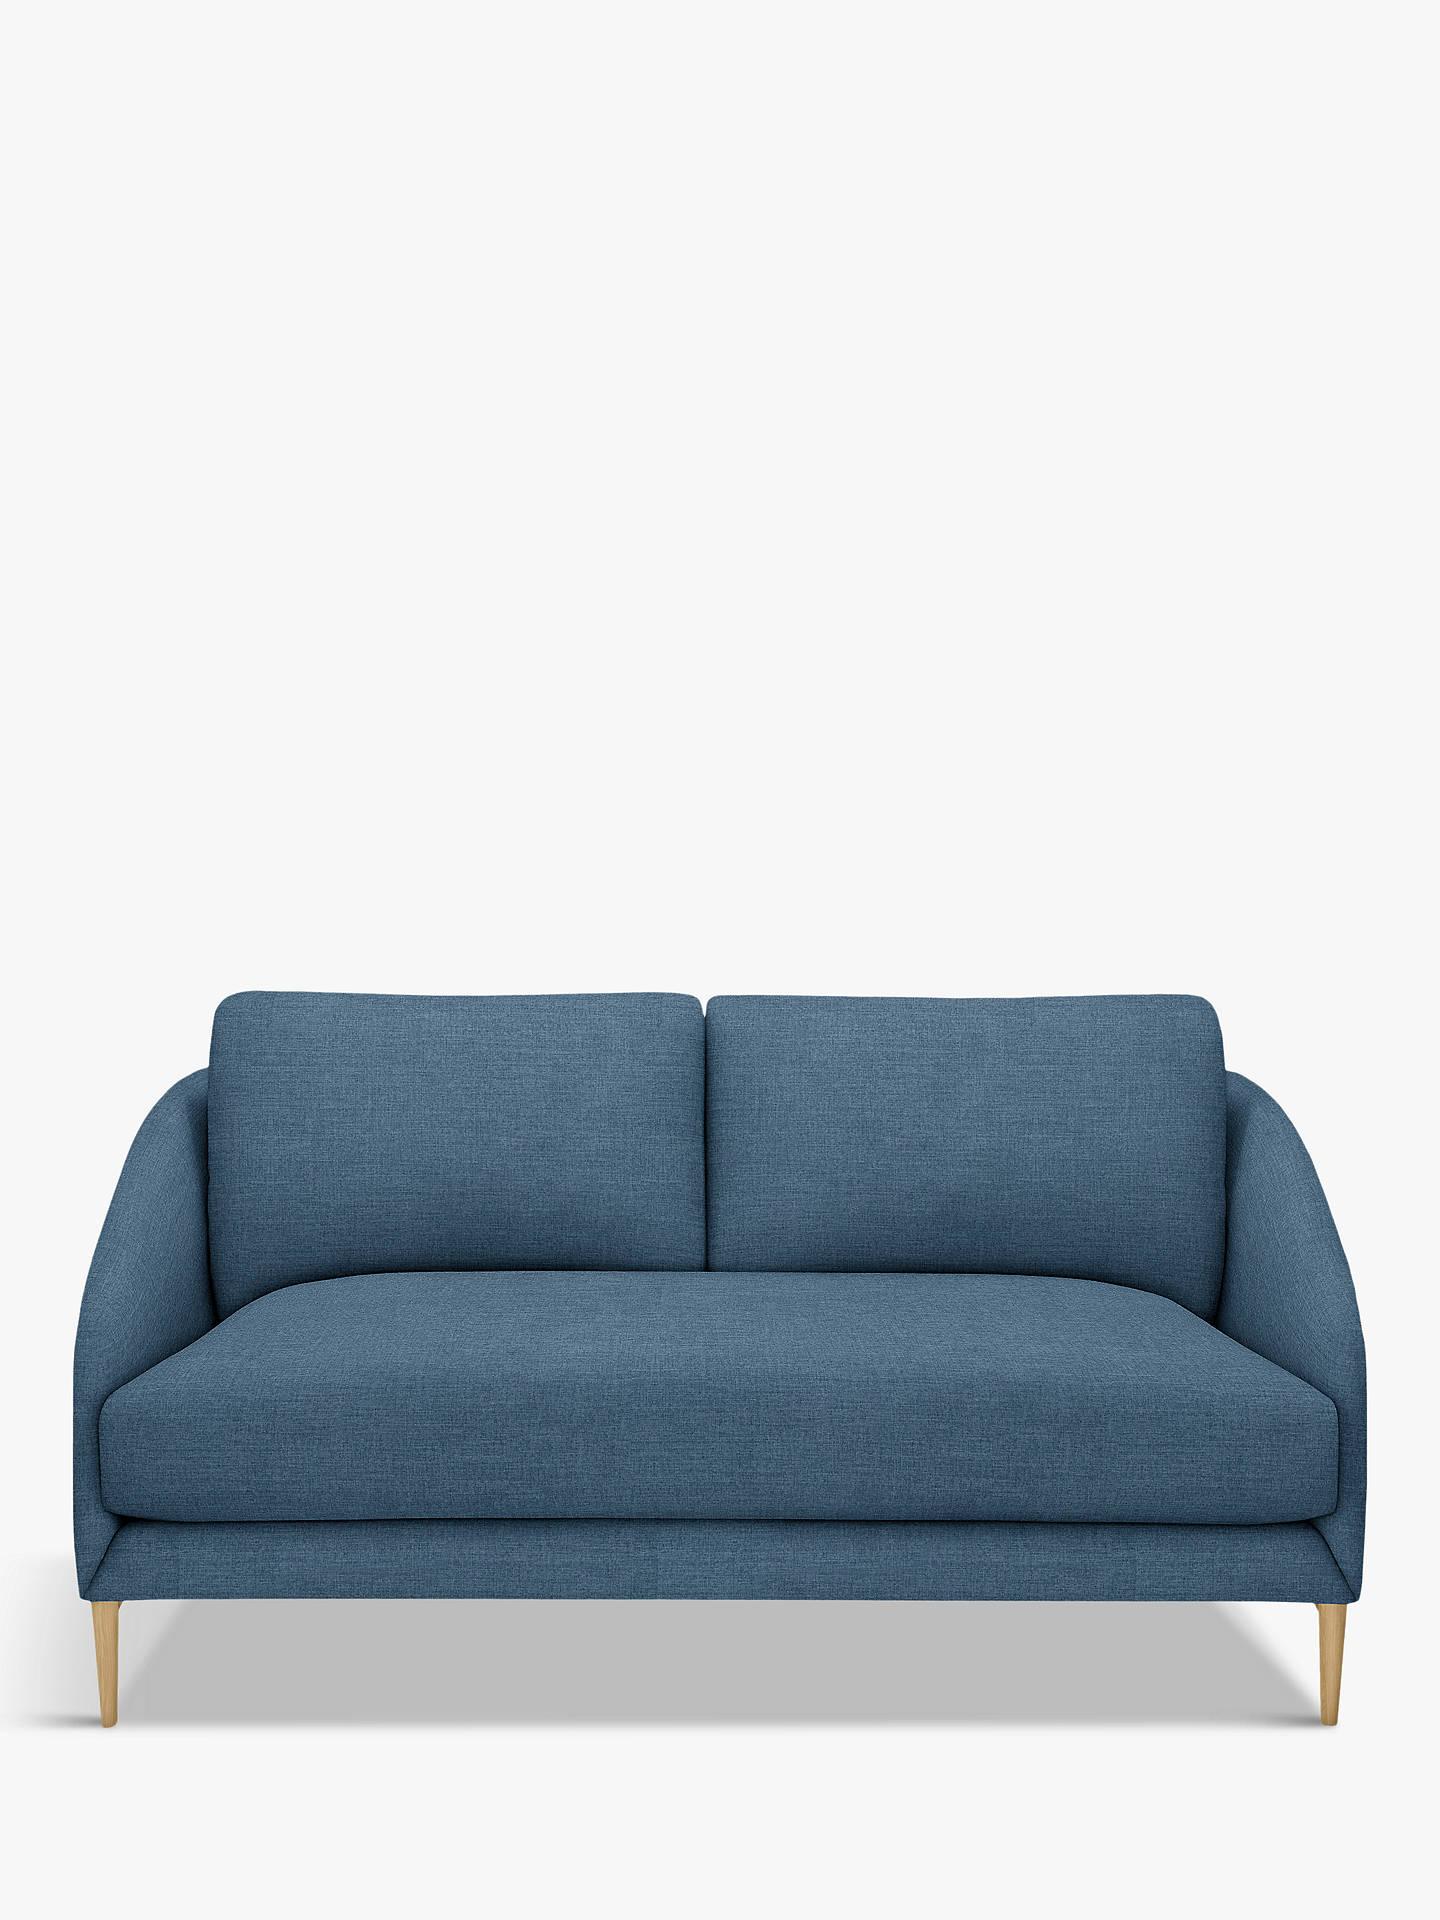 John Lewis Partners Cape Small 2 Seater Sofa Light Leg Hatton Dark Pacific